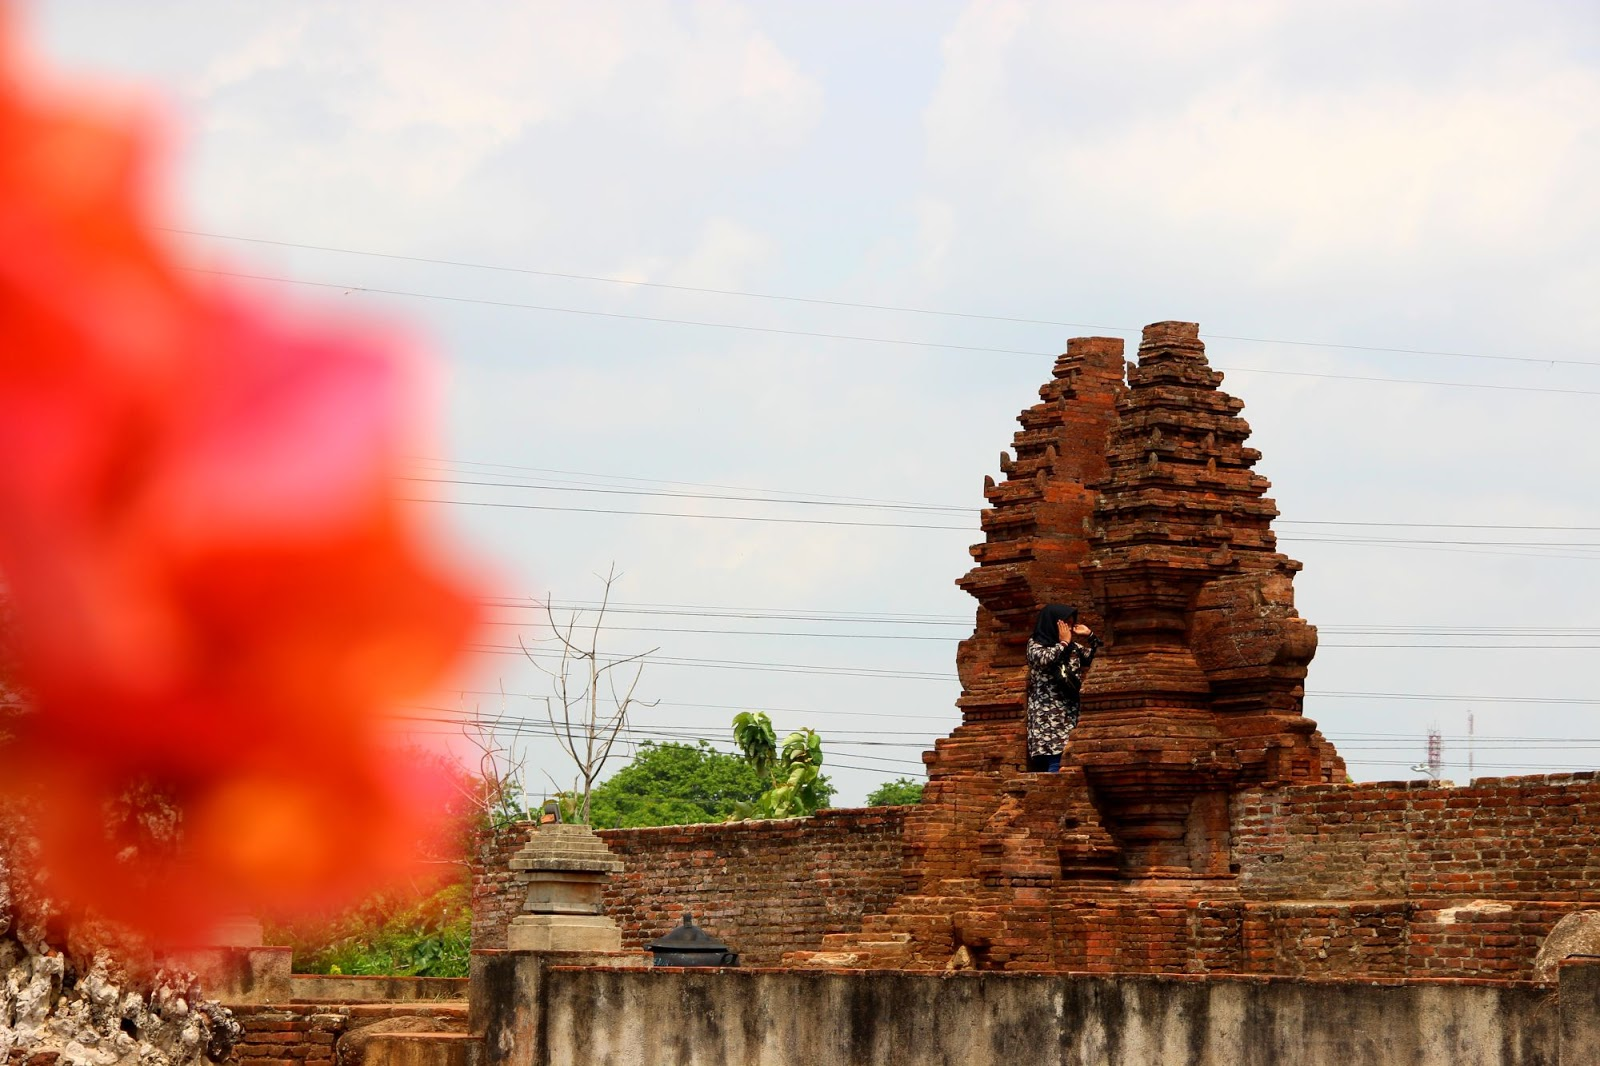 Mengintip Ritual Panjang Jimat Keraton Kanoman Cirebon Saat Maulid cee9a8ddaf